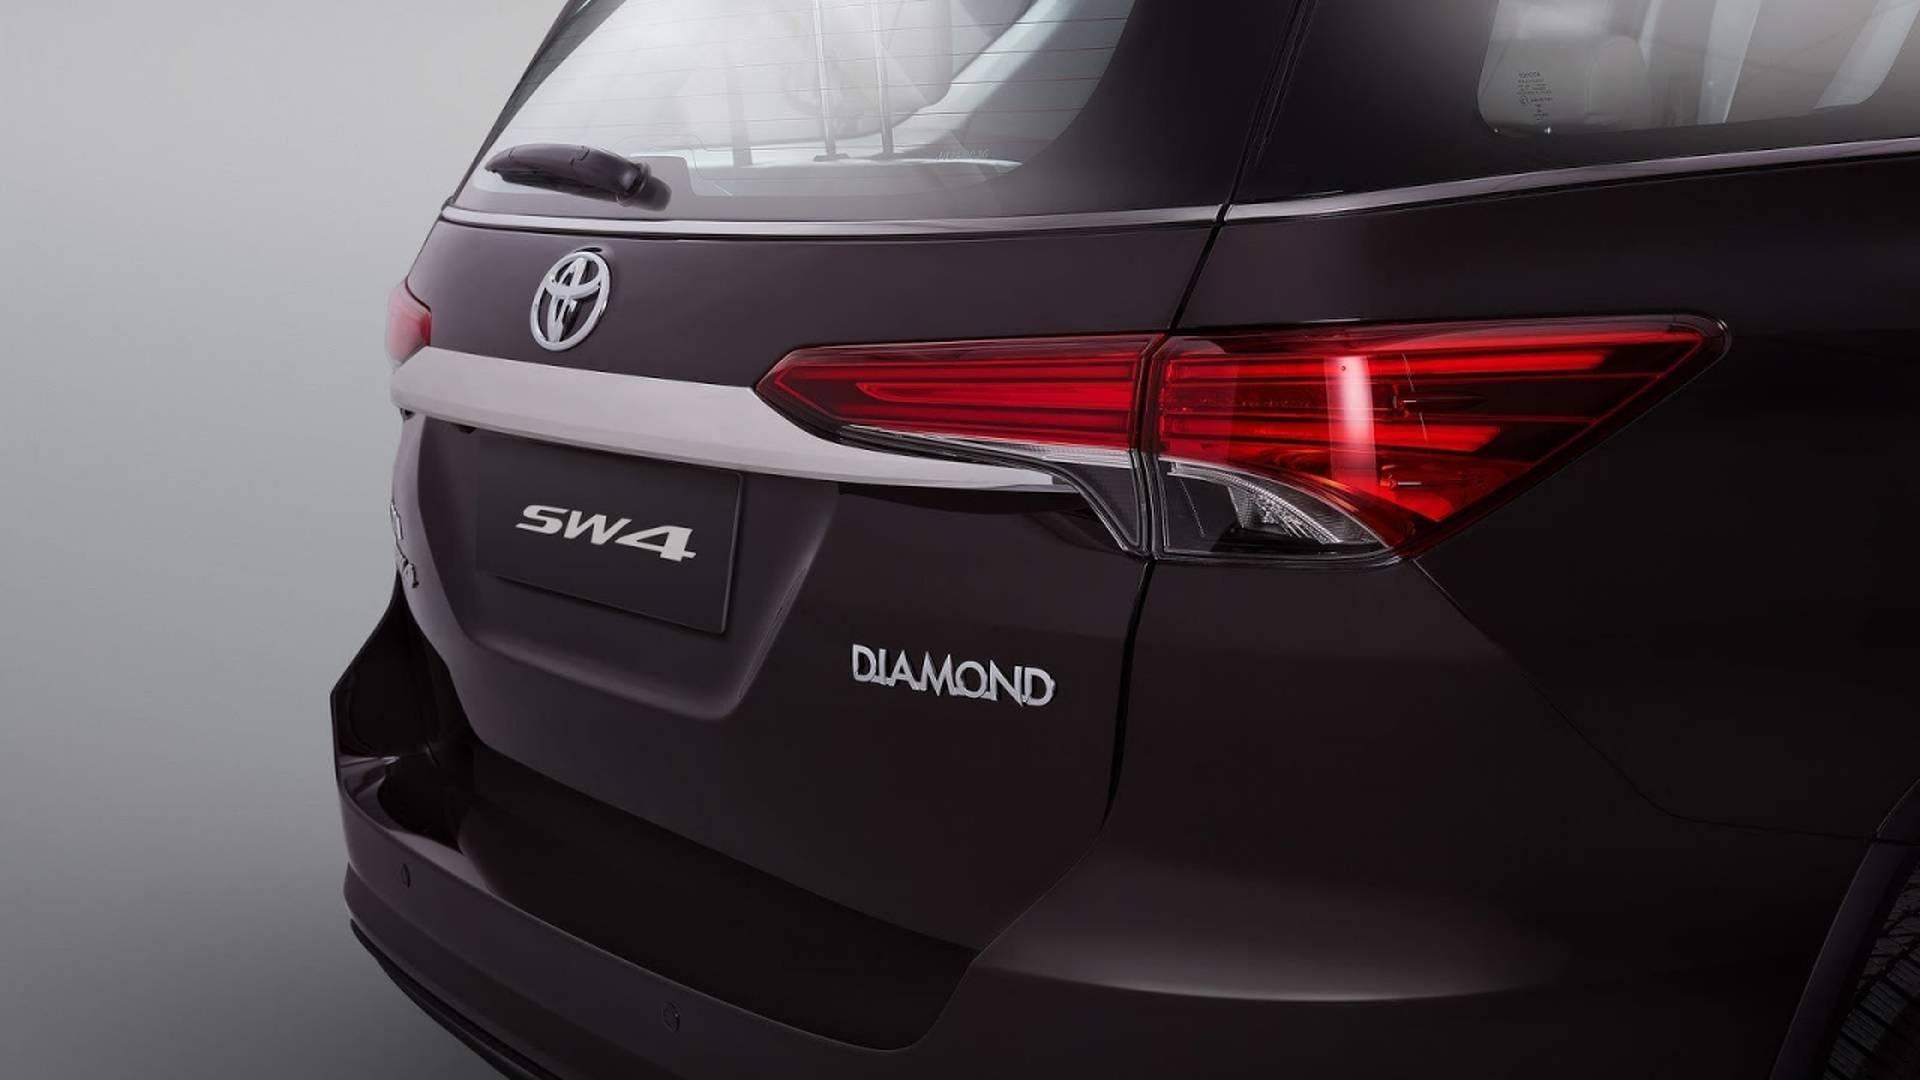 Toyota Hilux Diamond. Foto: Divulgação